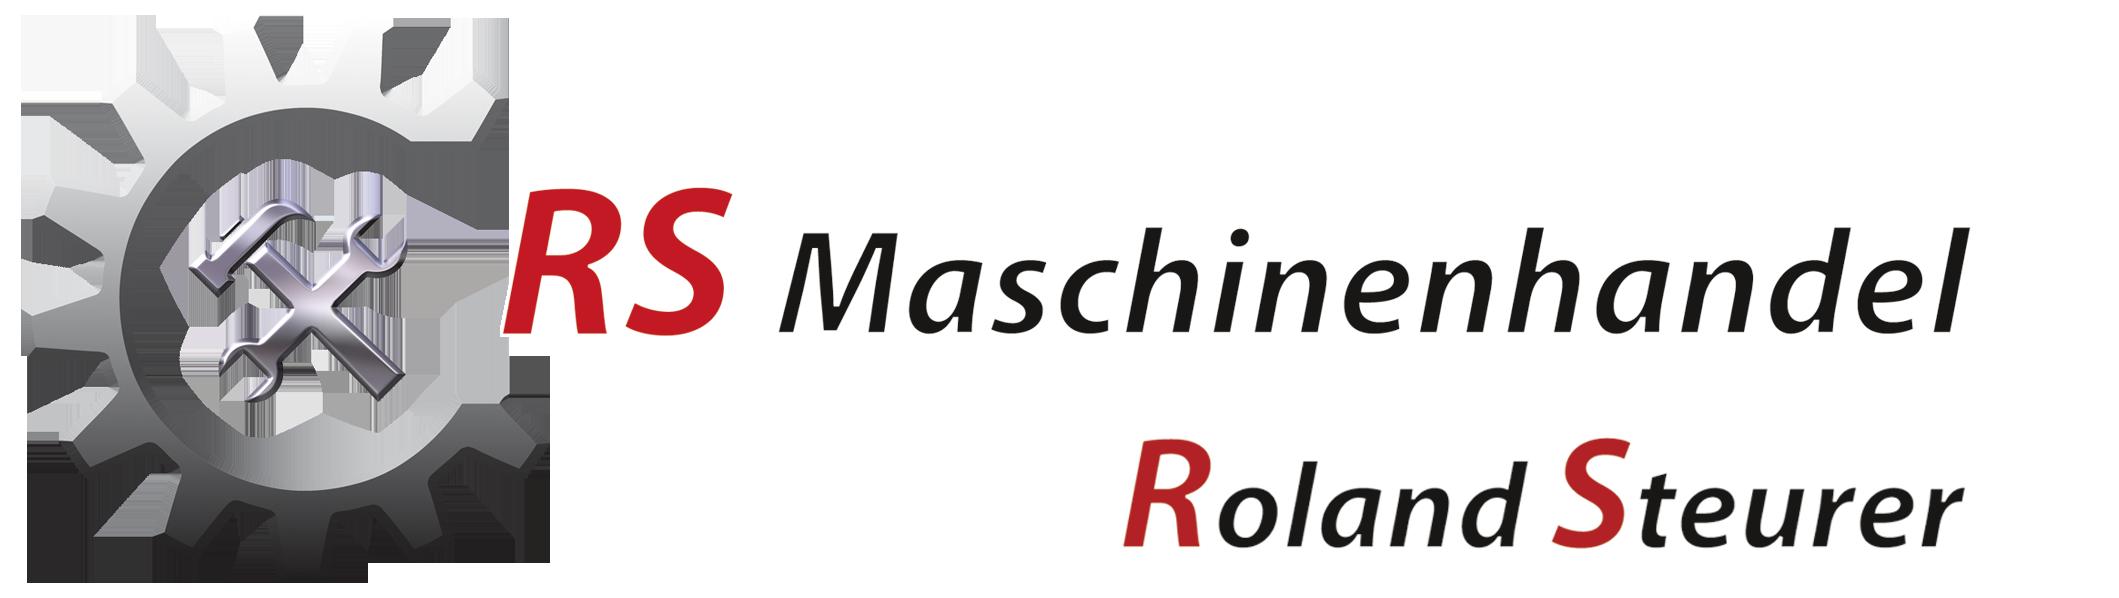 RS Maschinenhandel